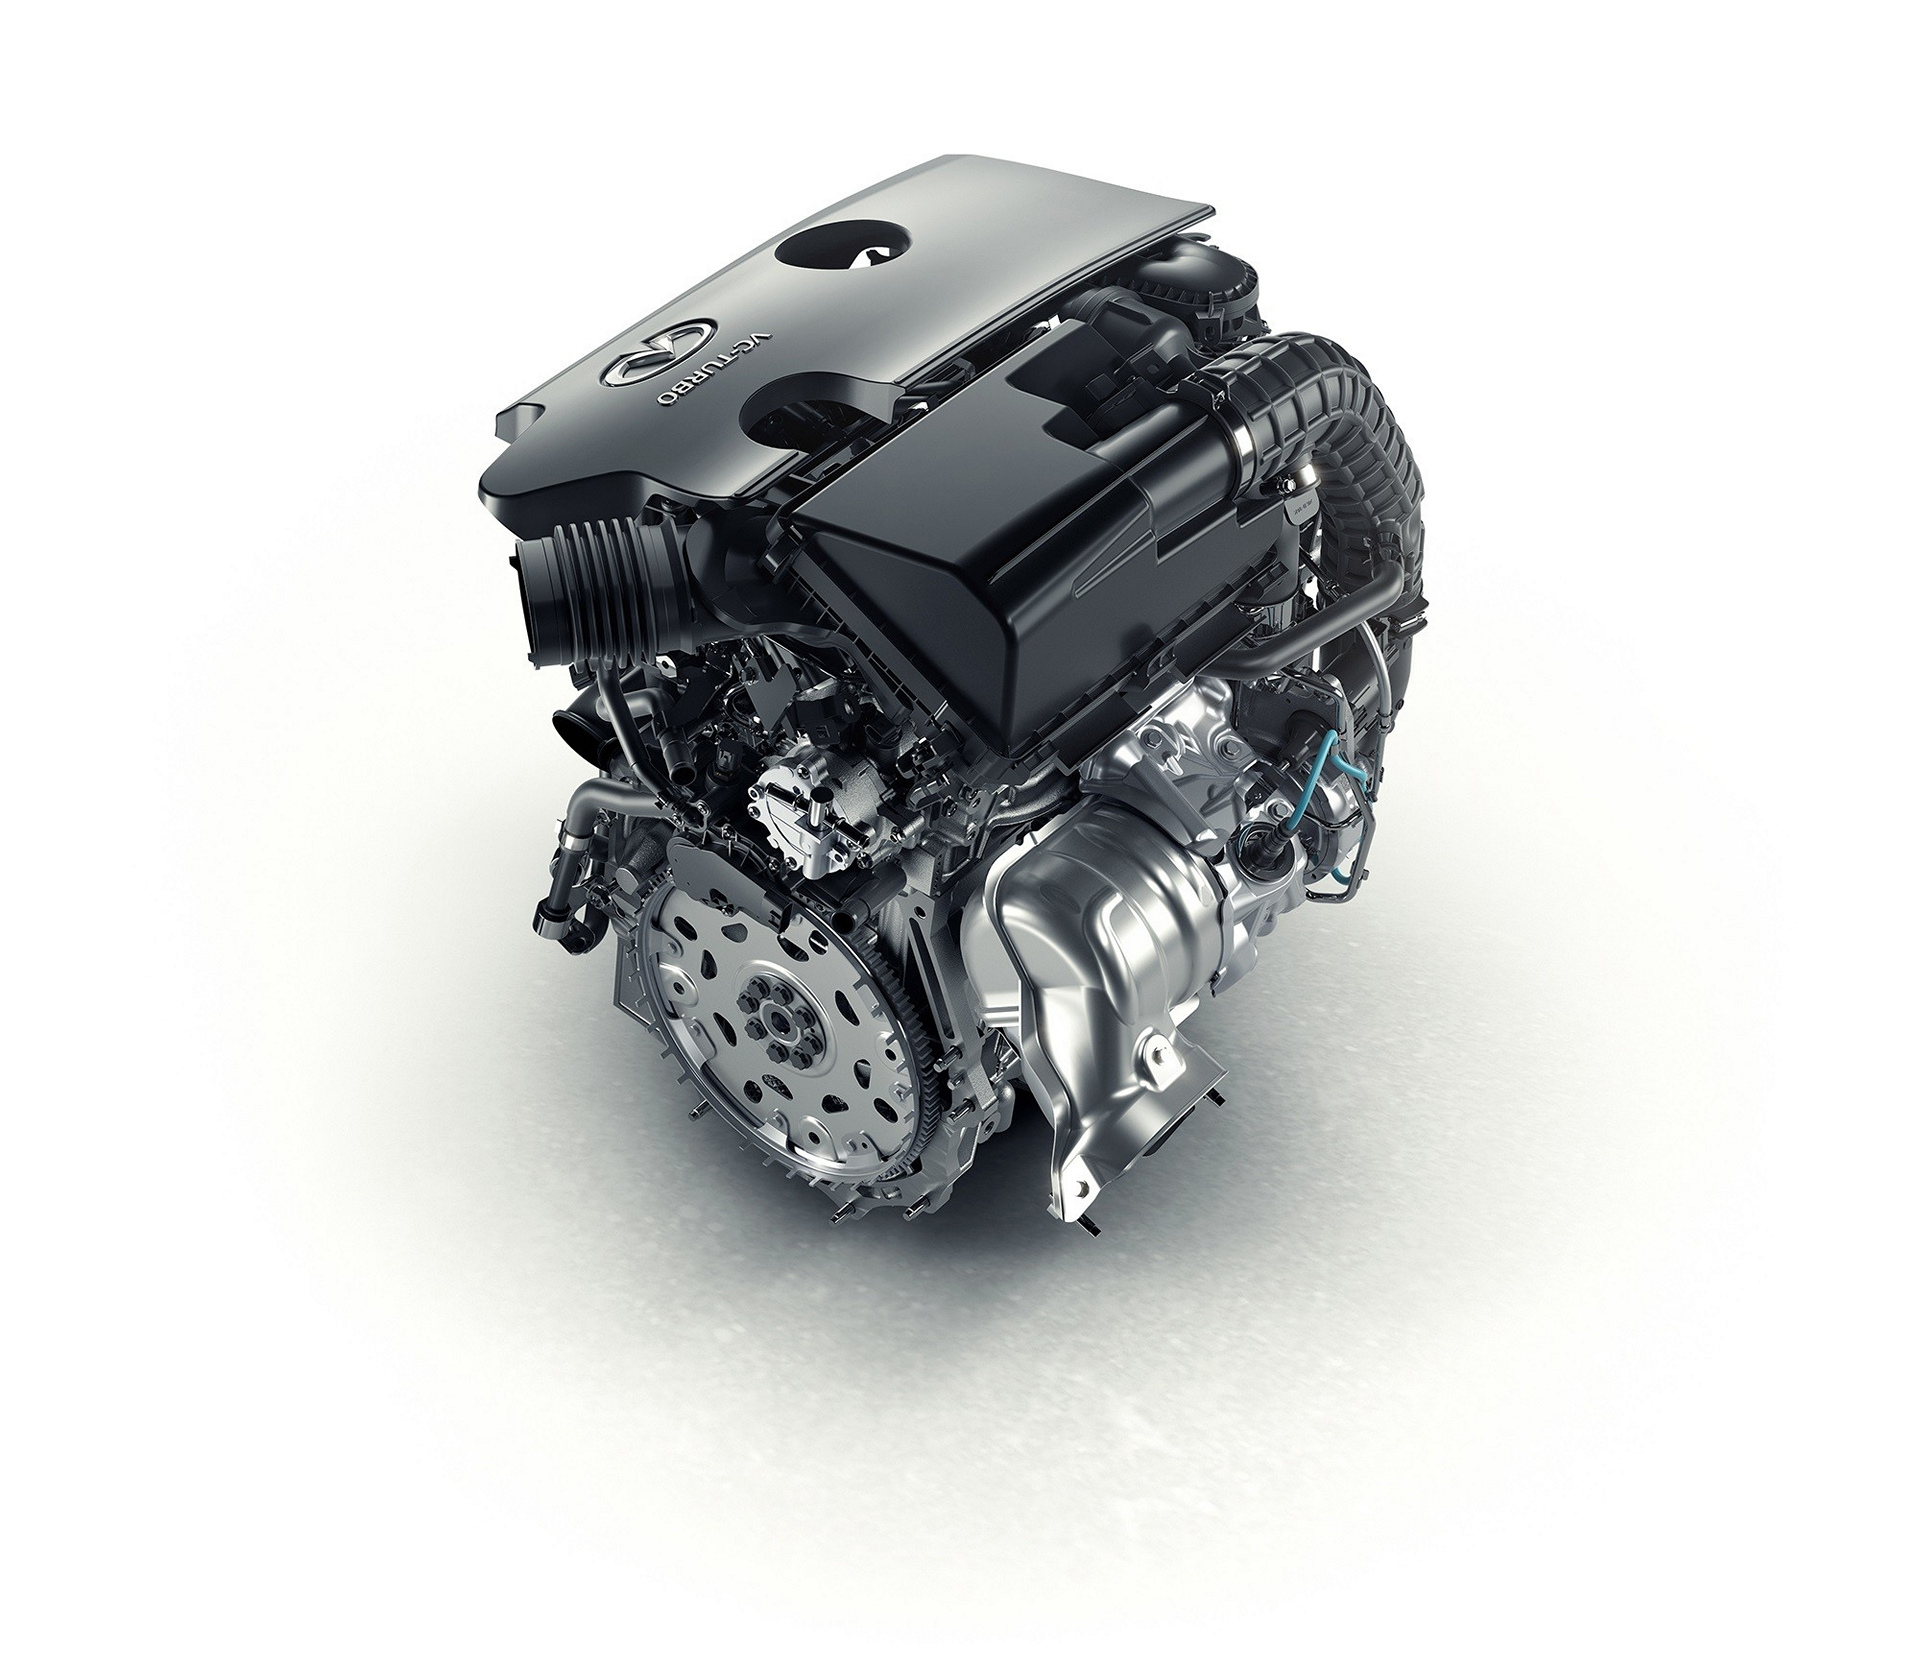 INFINITI four-cylinder turbocharged gasoline VC-T engine © Nissan Motor Co., Ltd.